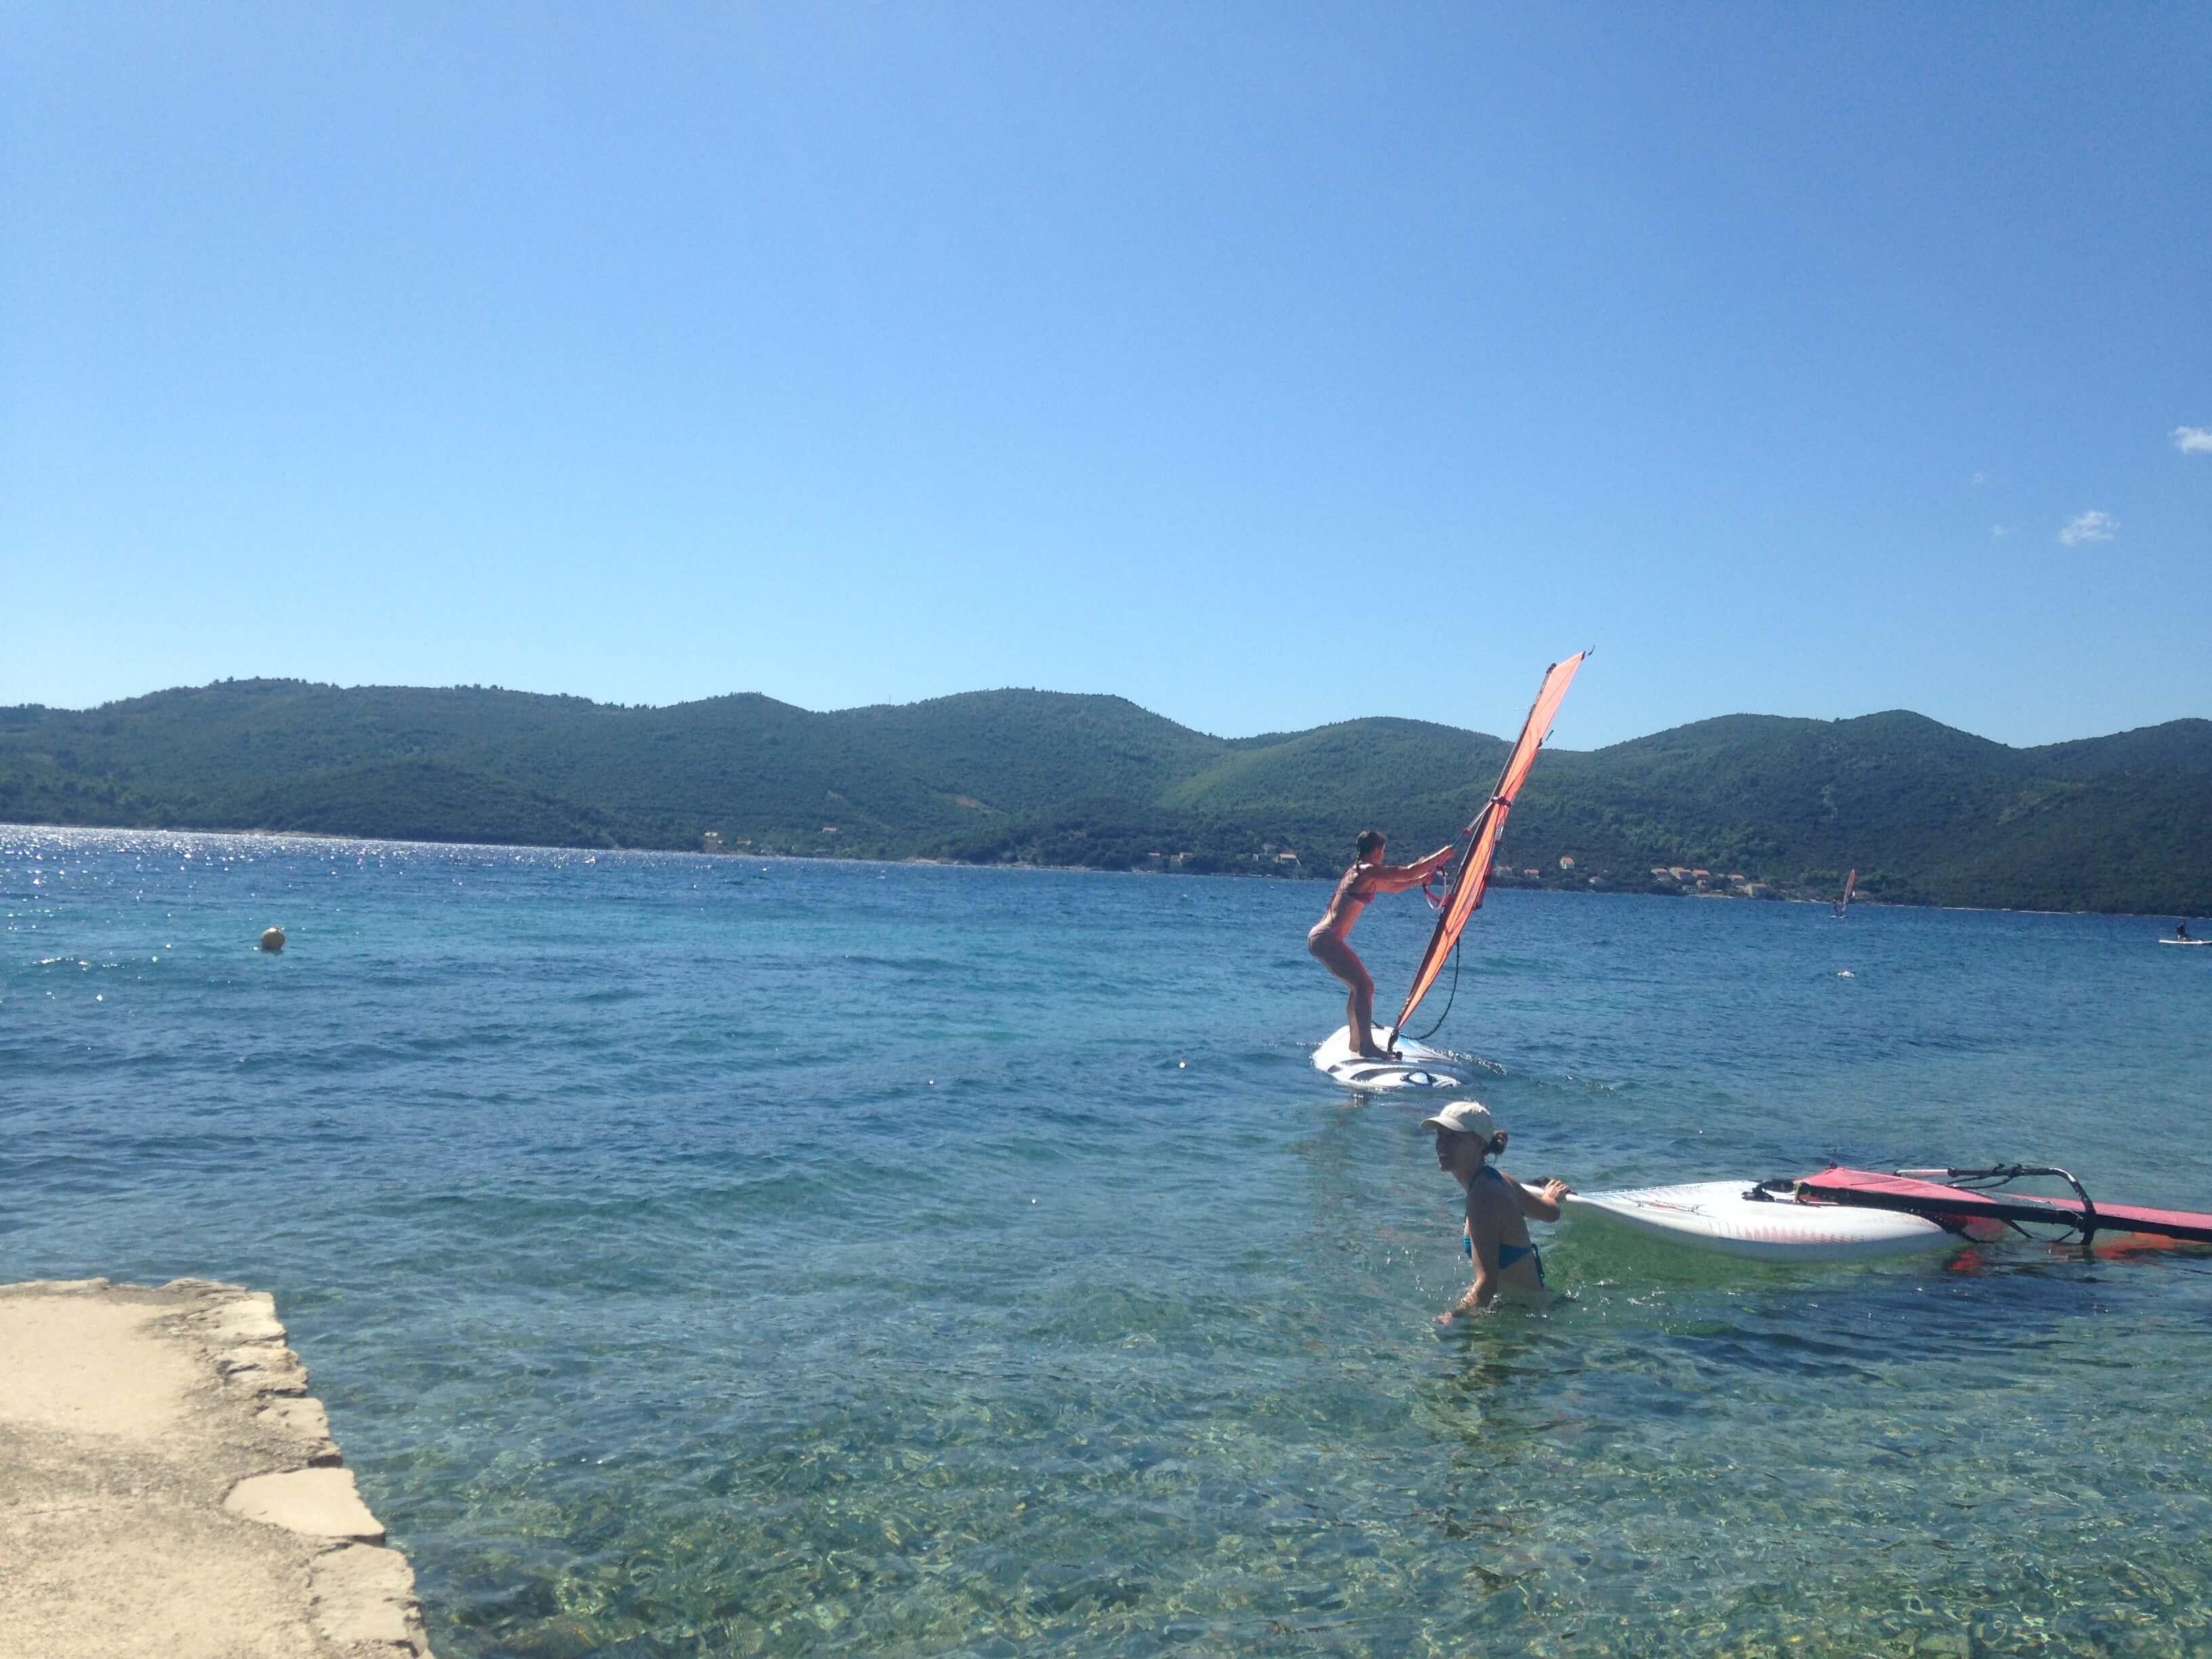 Peljac Peninsula and Little Dubrovnik, 5 destinations in Croatia